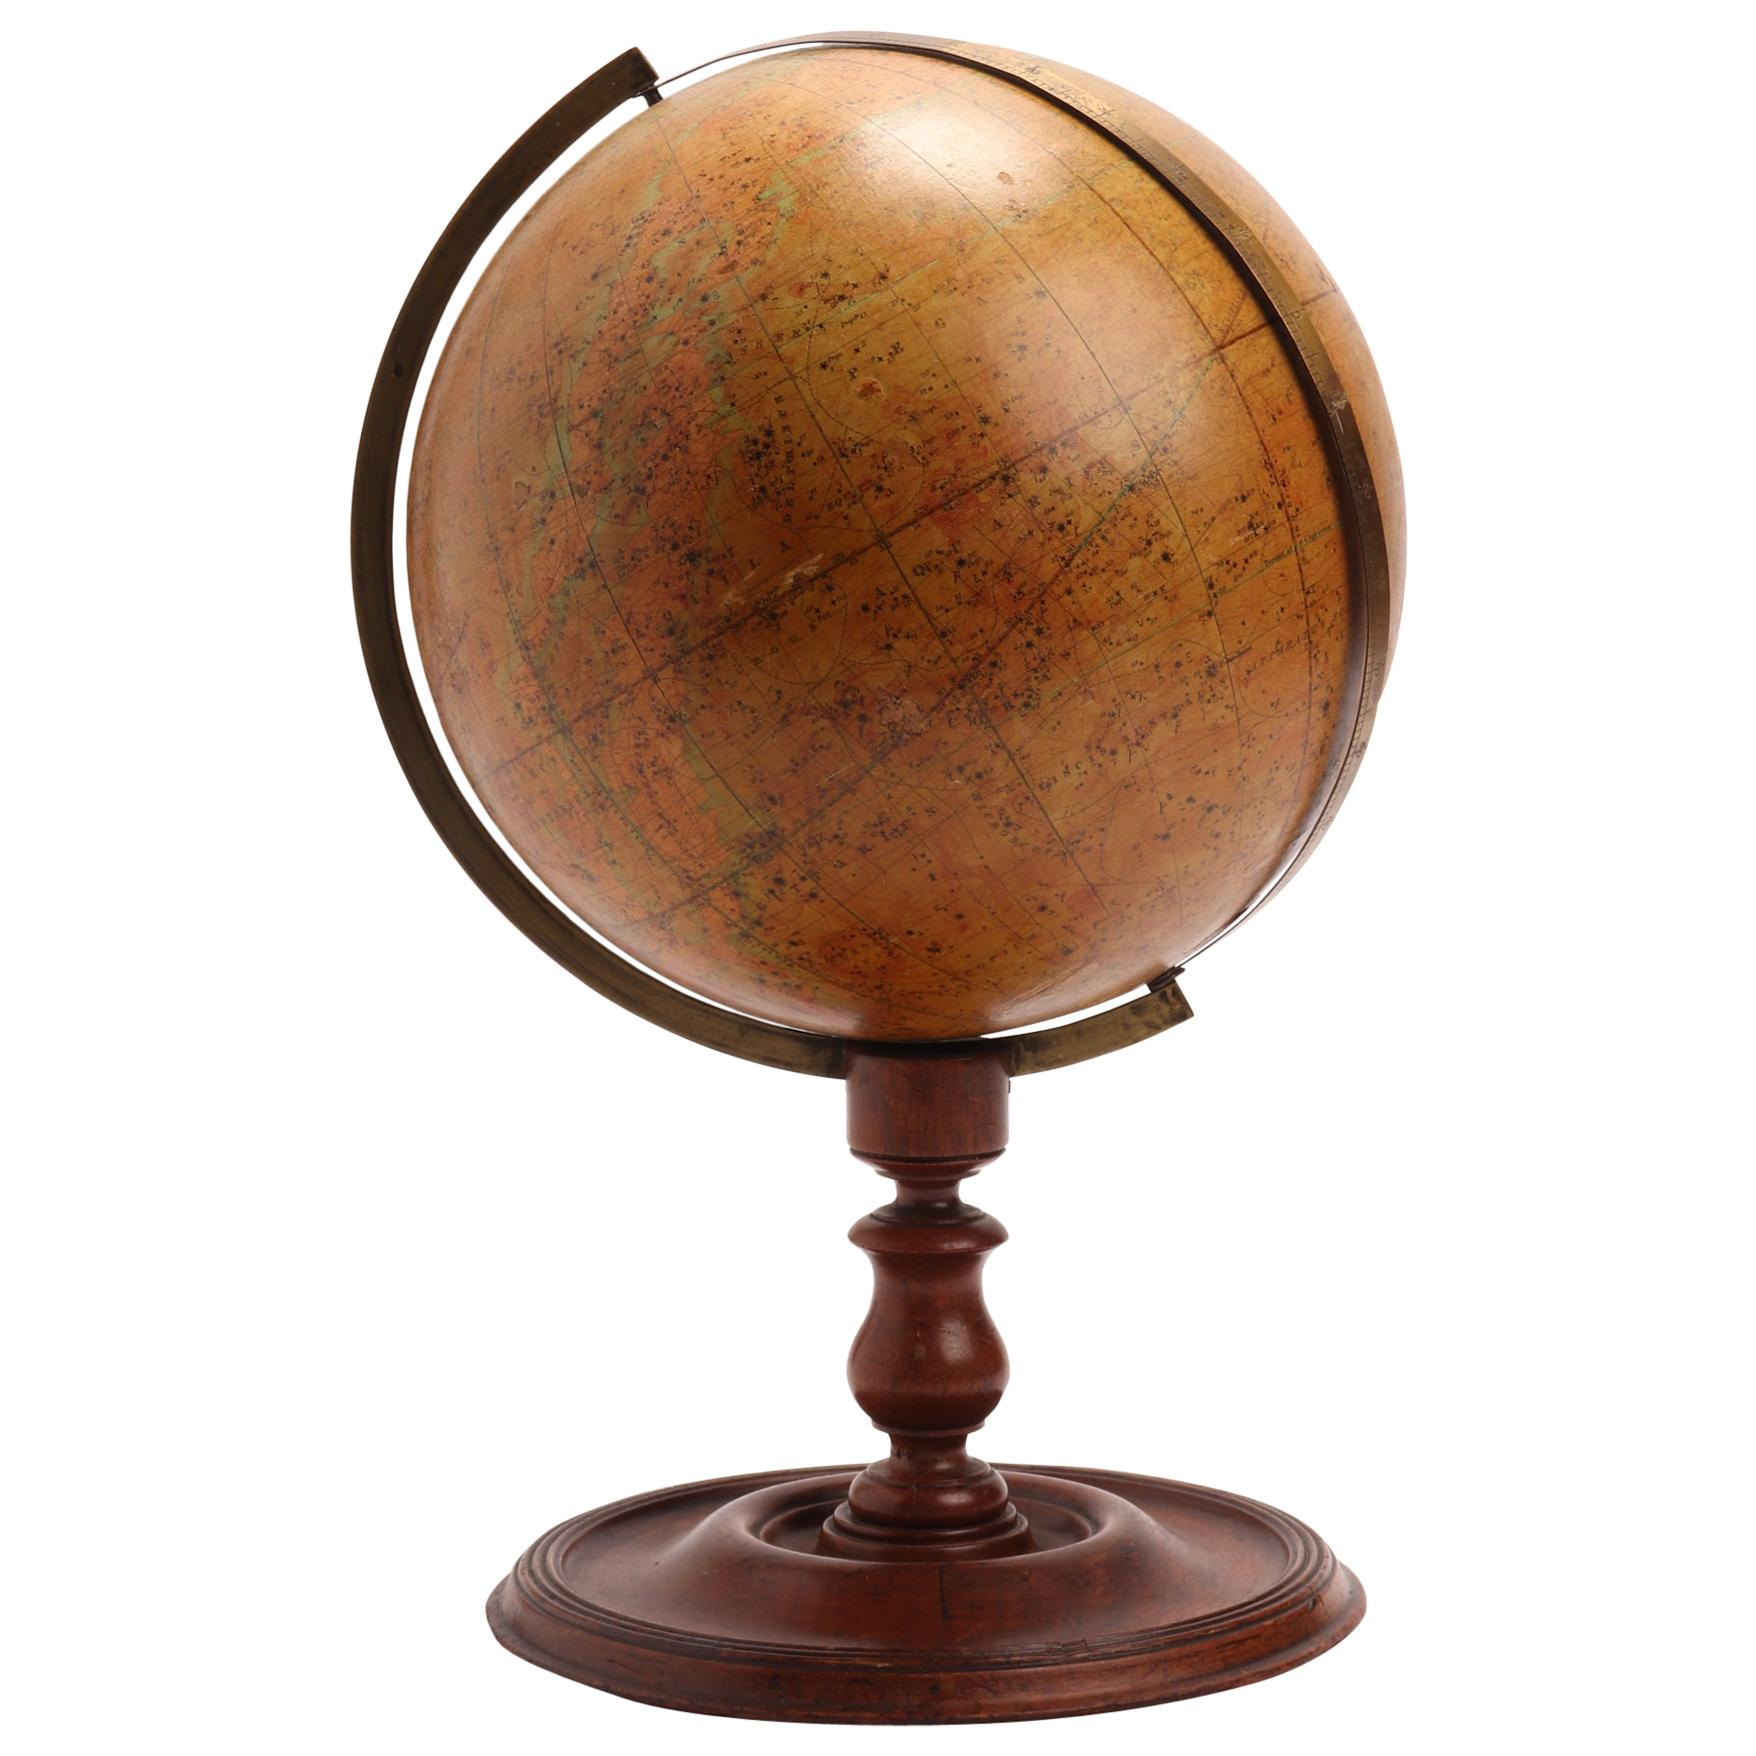 Celestial Globe. London 1860.